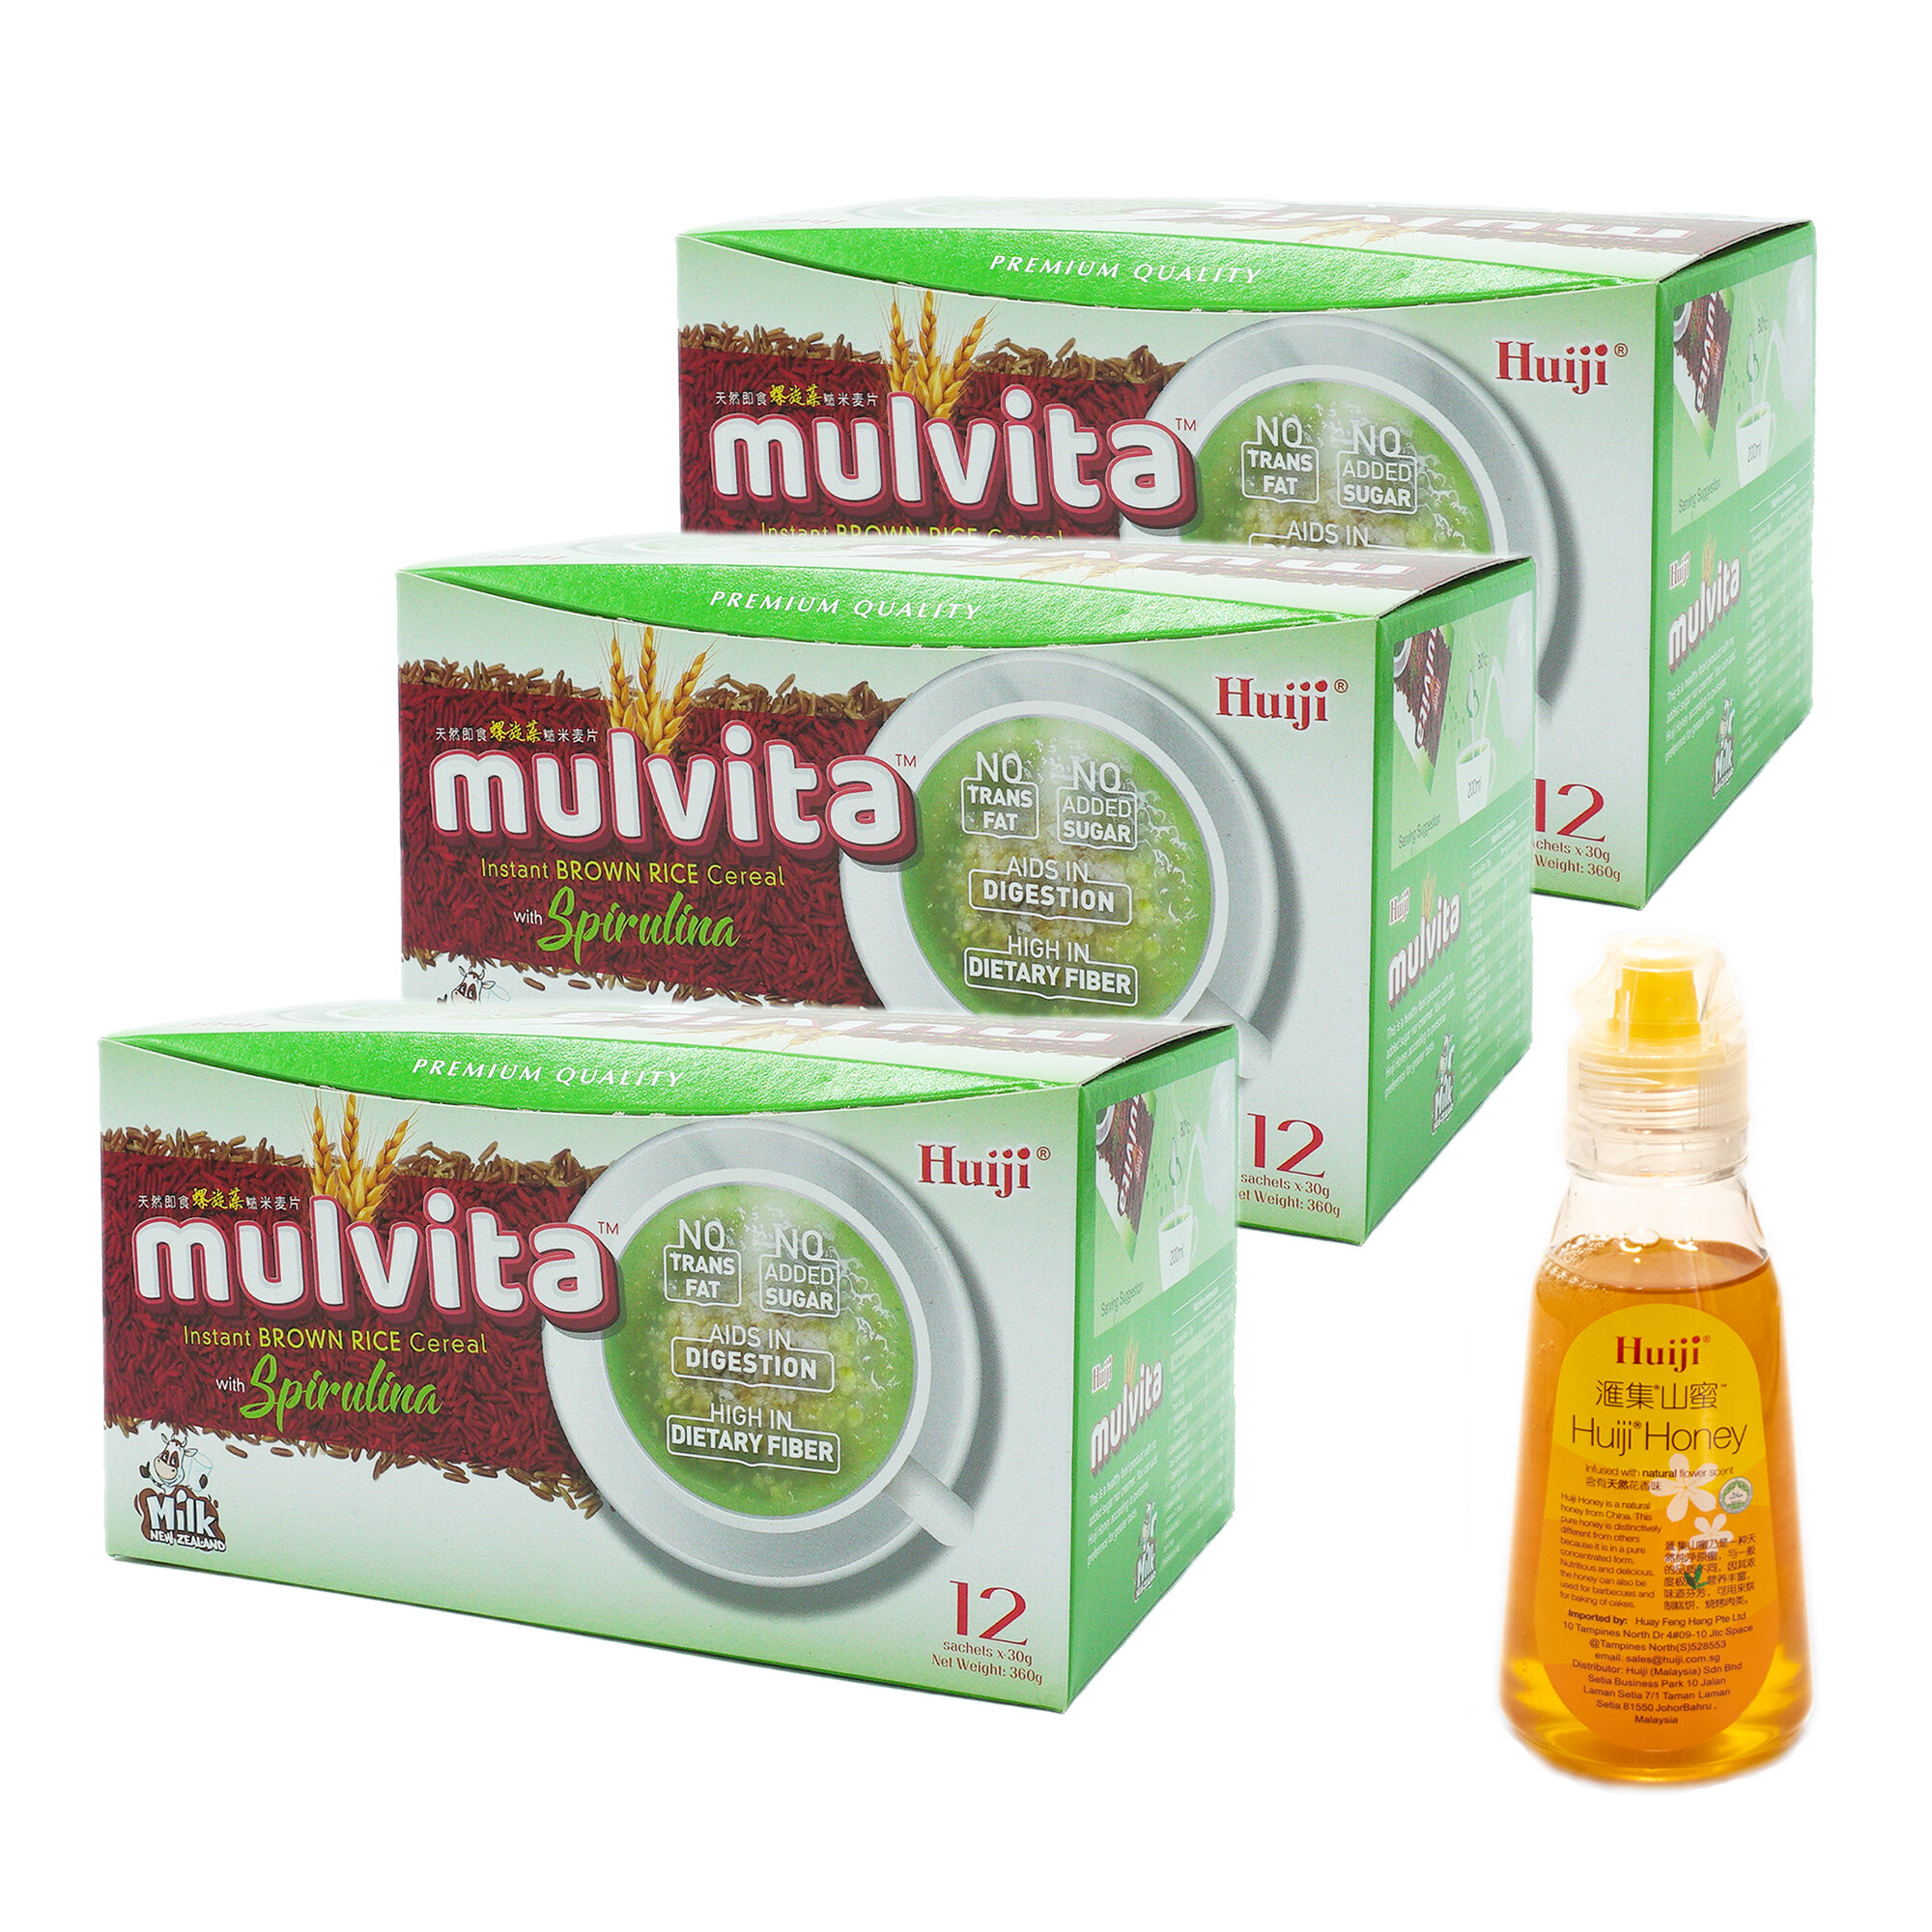 2x Huiji Mulvita Brown Rice Cereal with Spirulina + FREE Mulvita Brown Rice Cereal + FREE Honey 200g